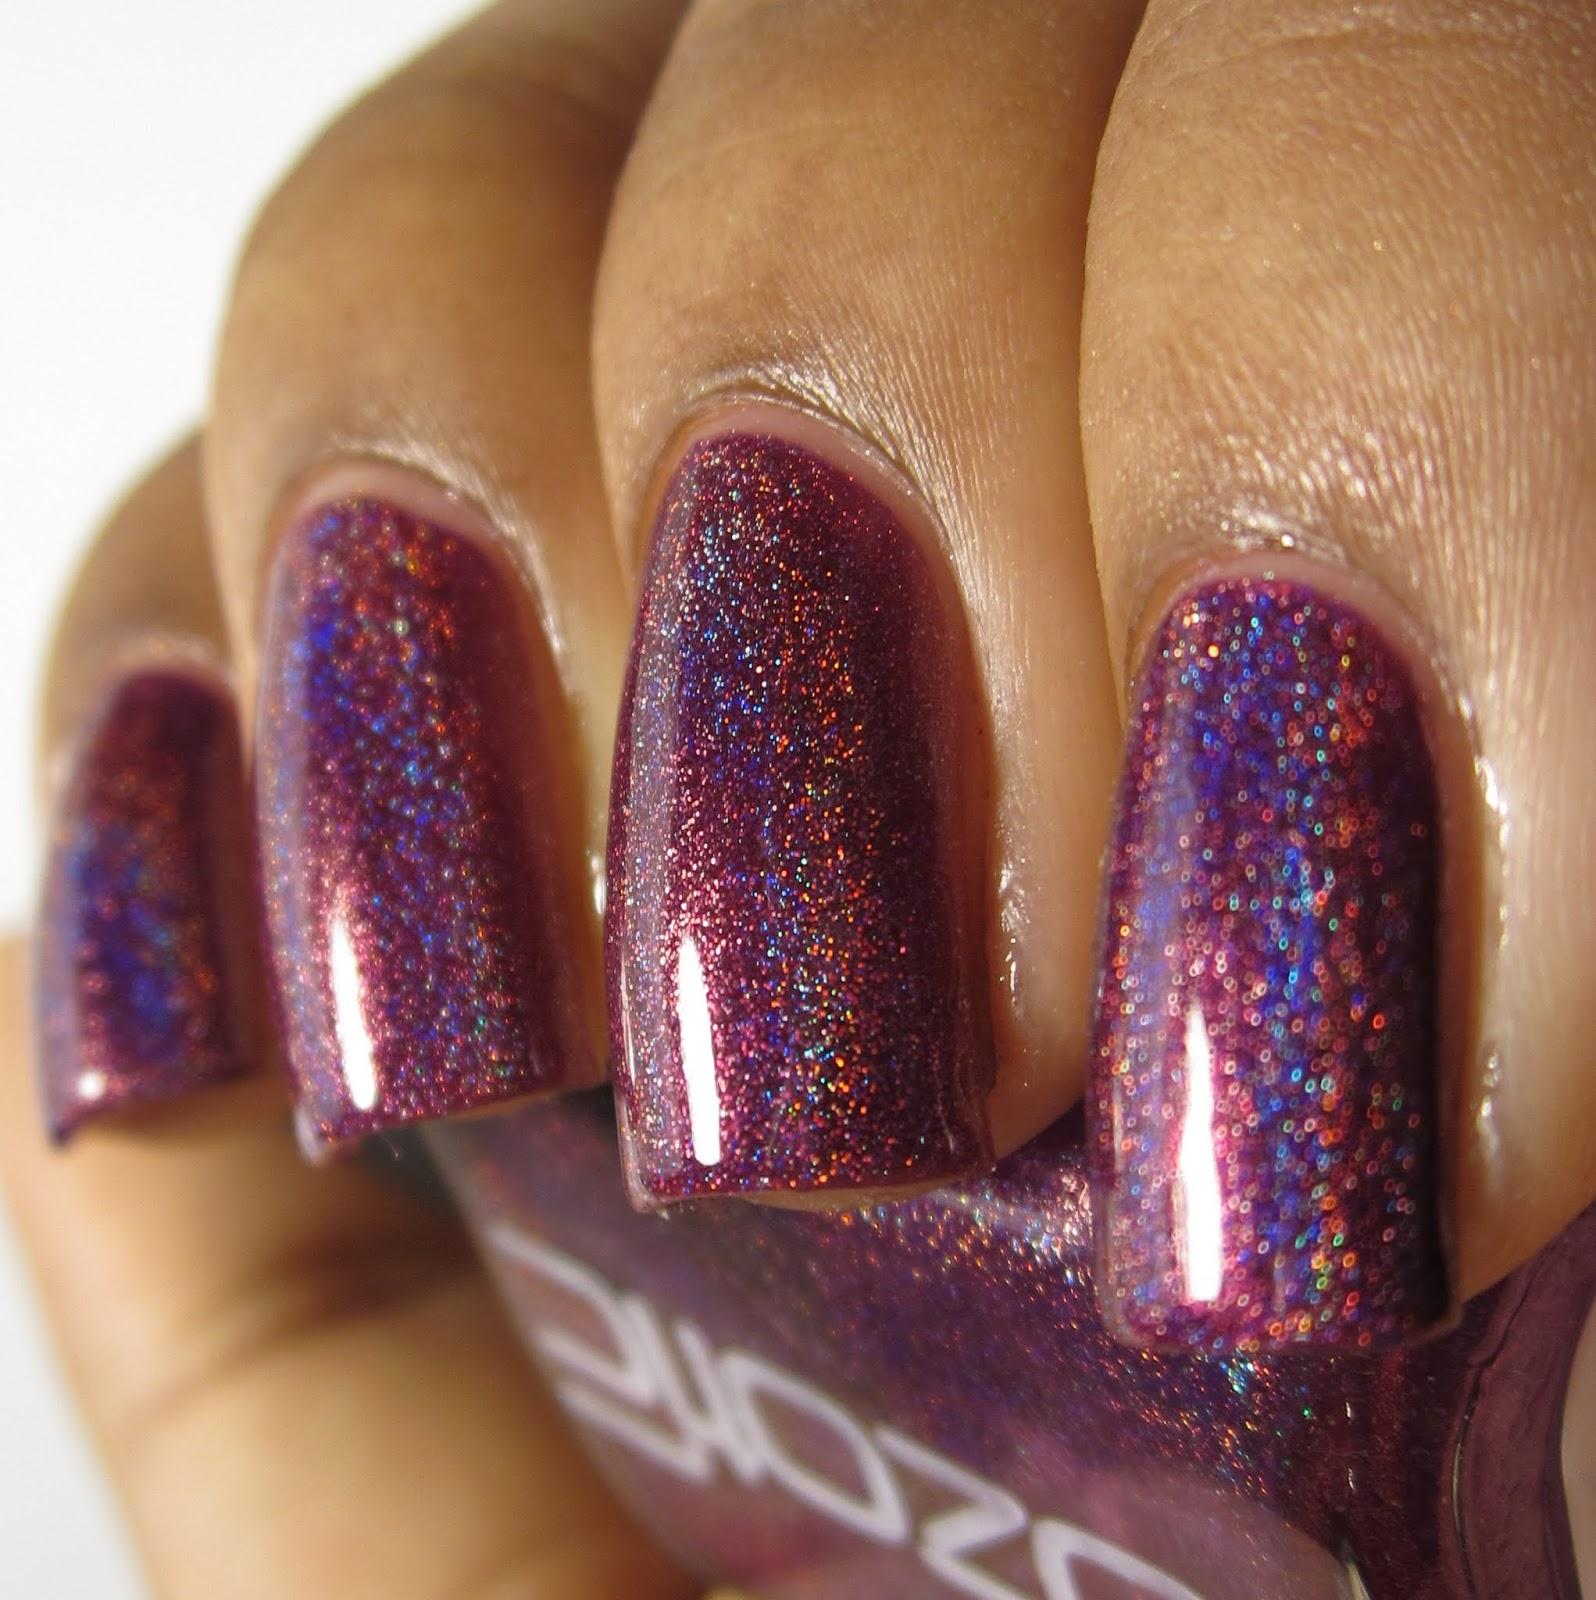 Ozotic Pro 513 purple holo nail polish swatch